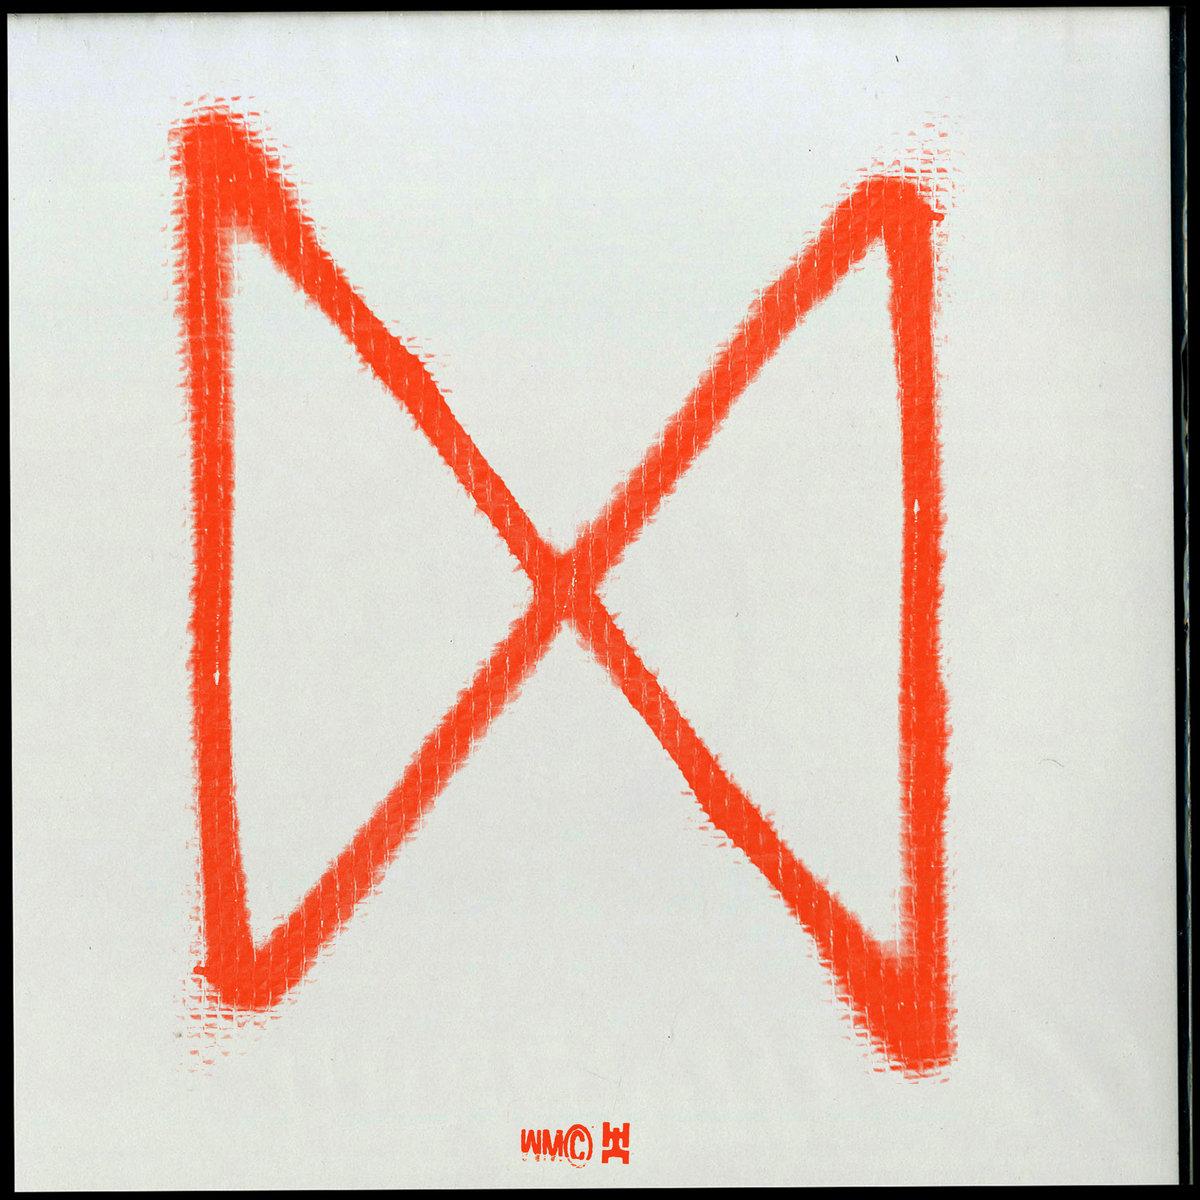 Post-punk shivers – Working Men's Club – X